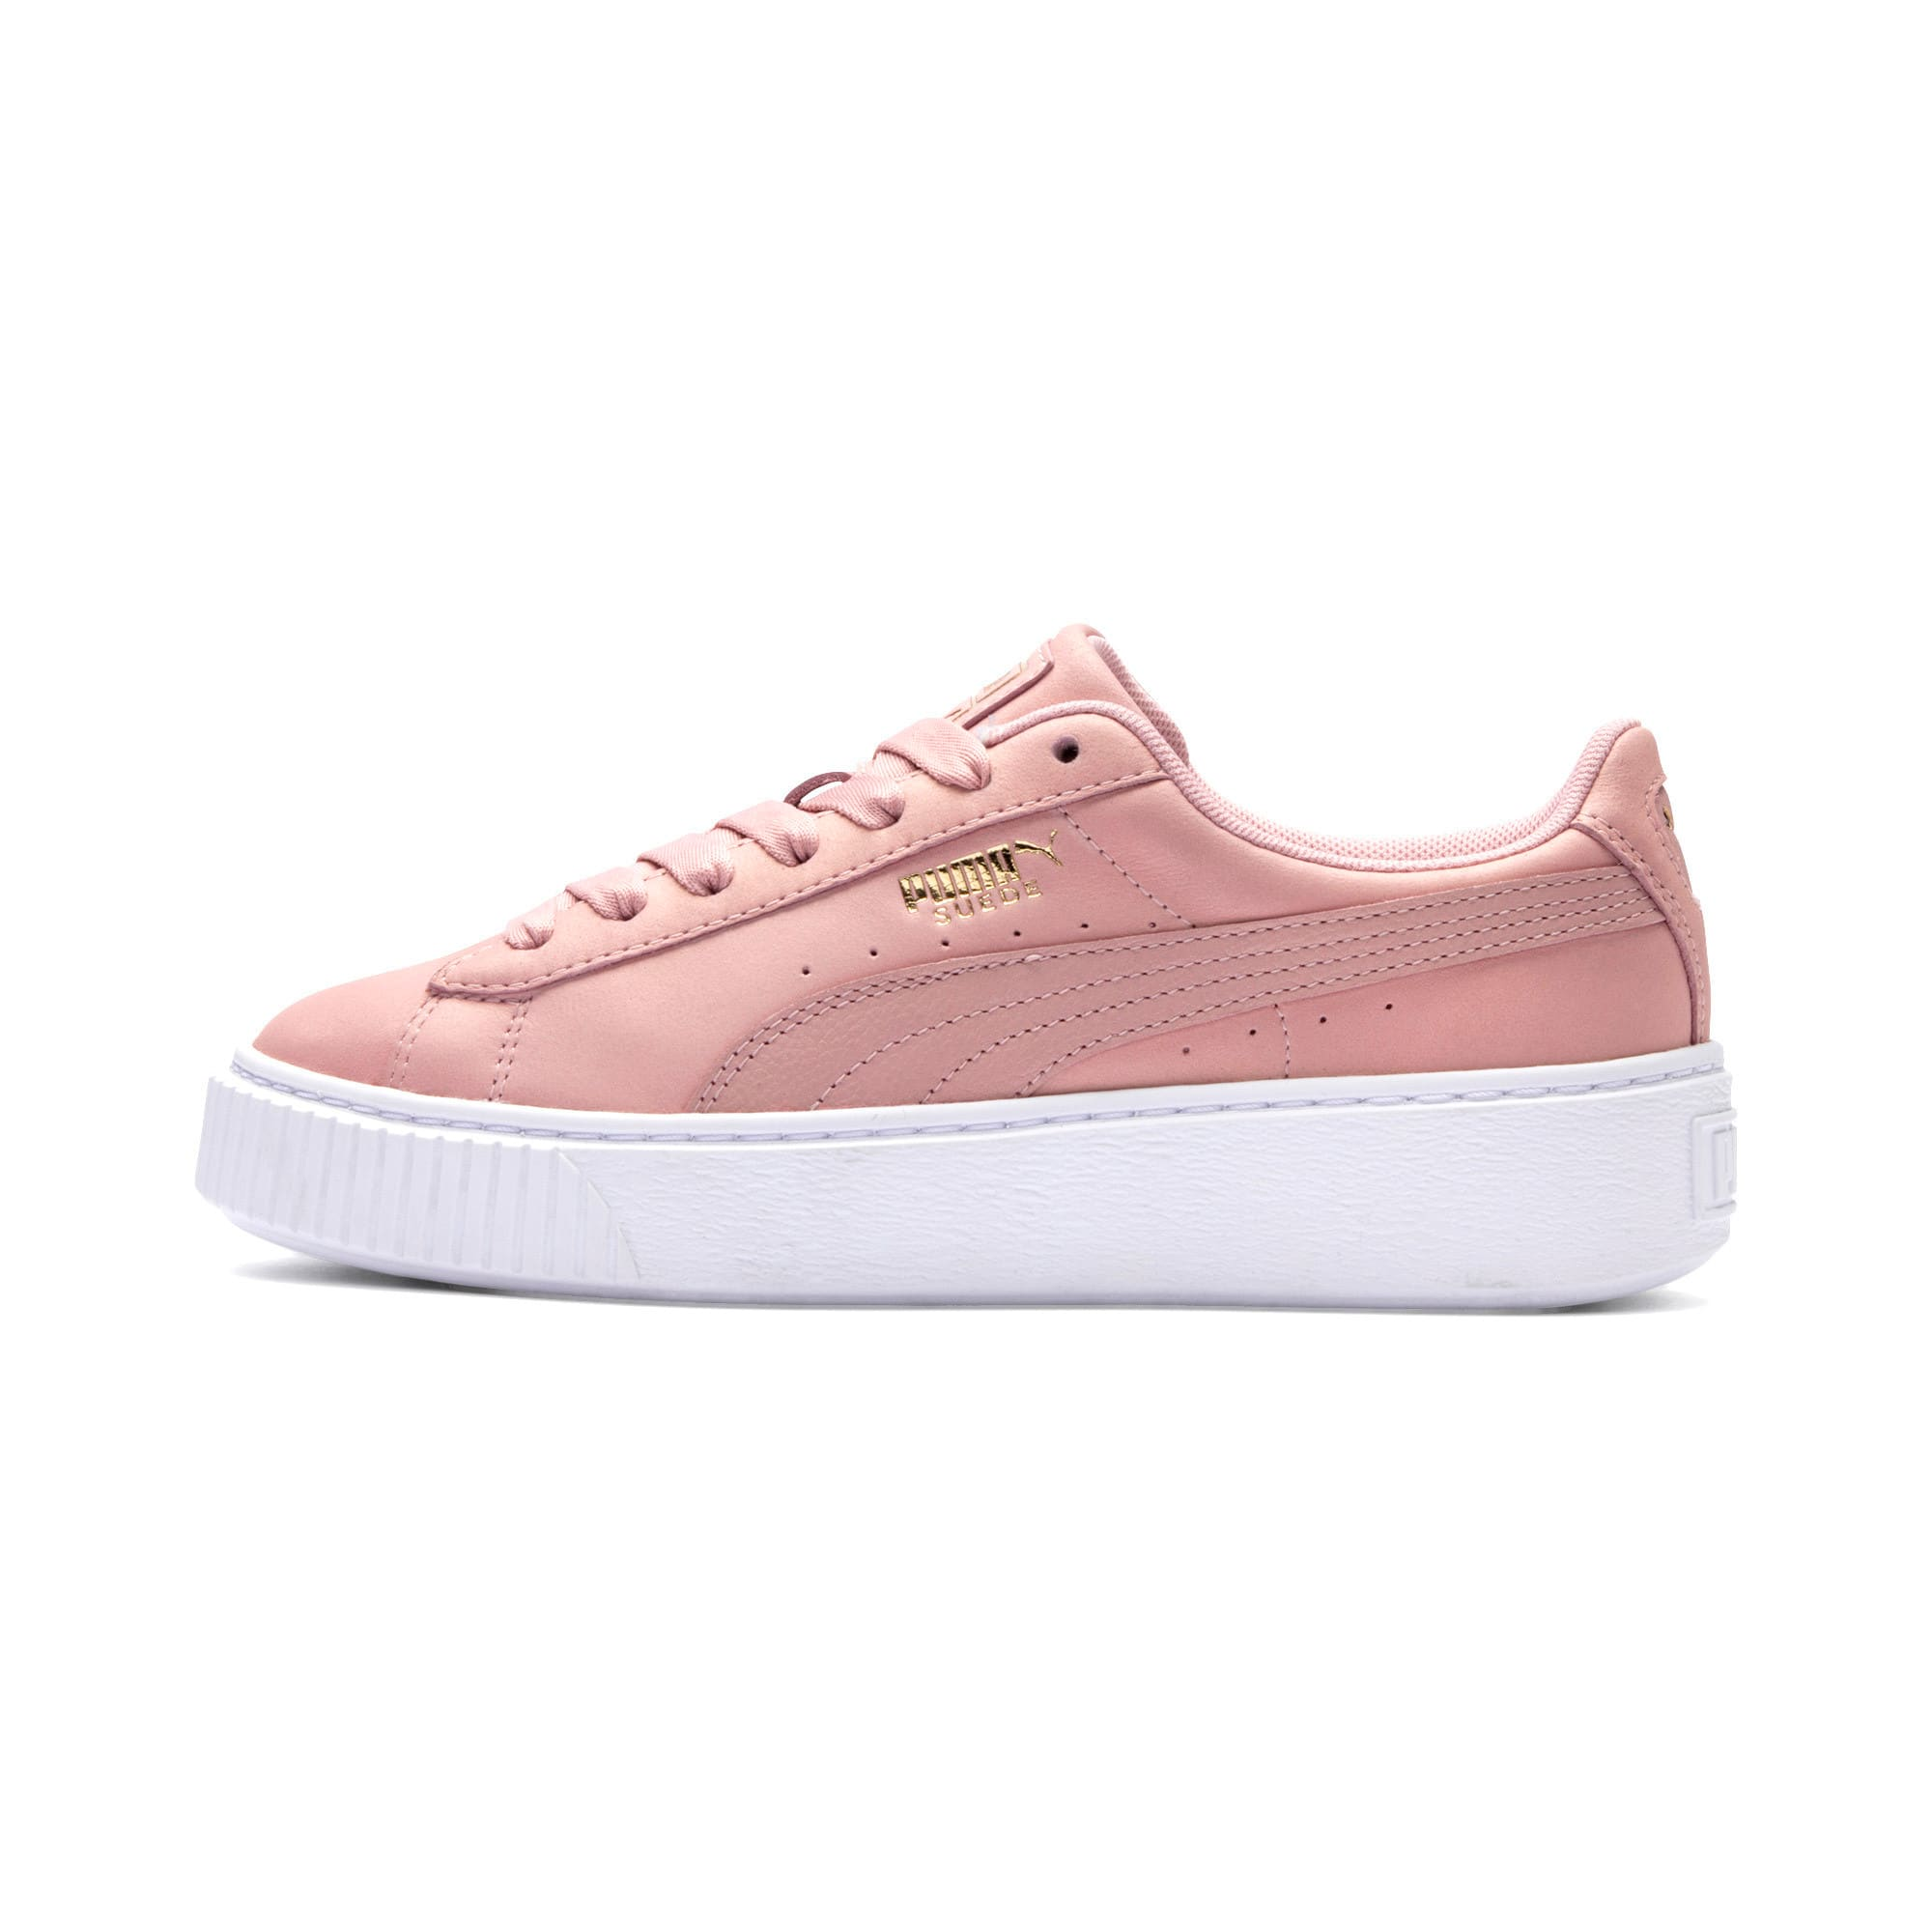 grand choix de 848fc 15755 Suede Platform Shimmer Women's Sneakers